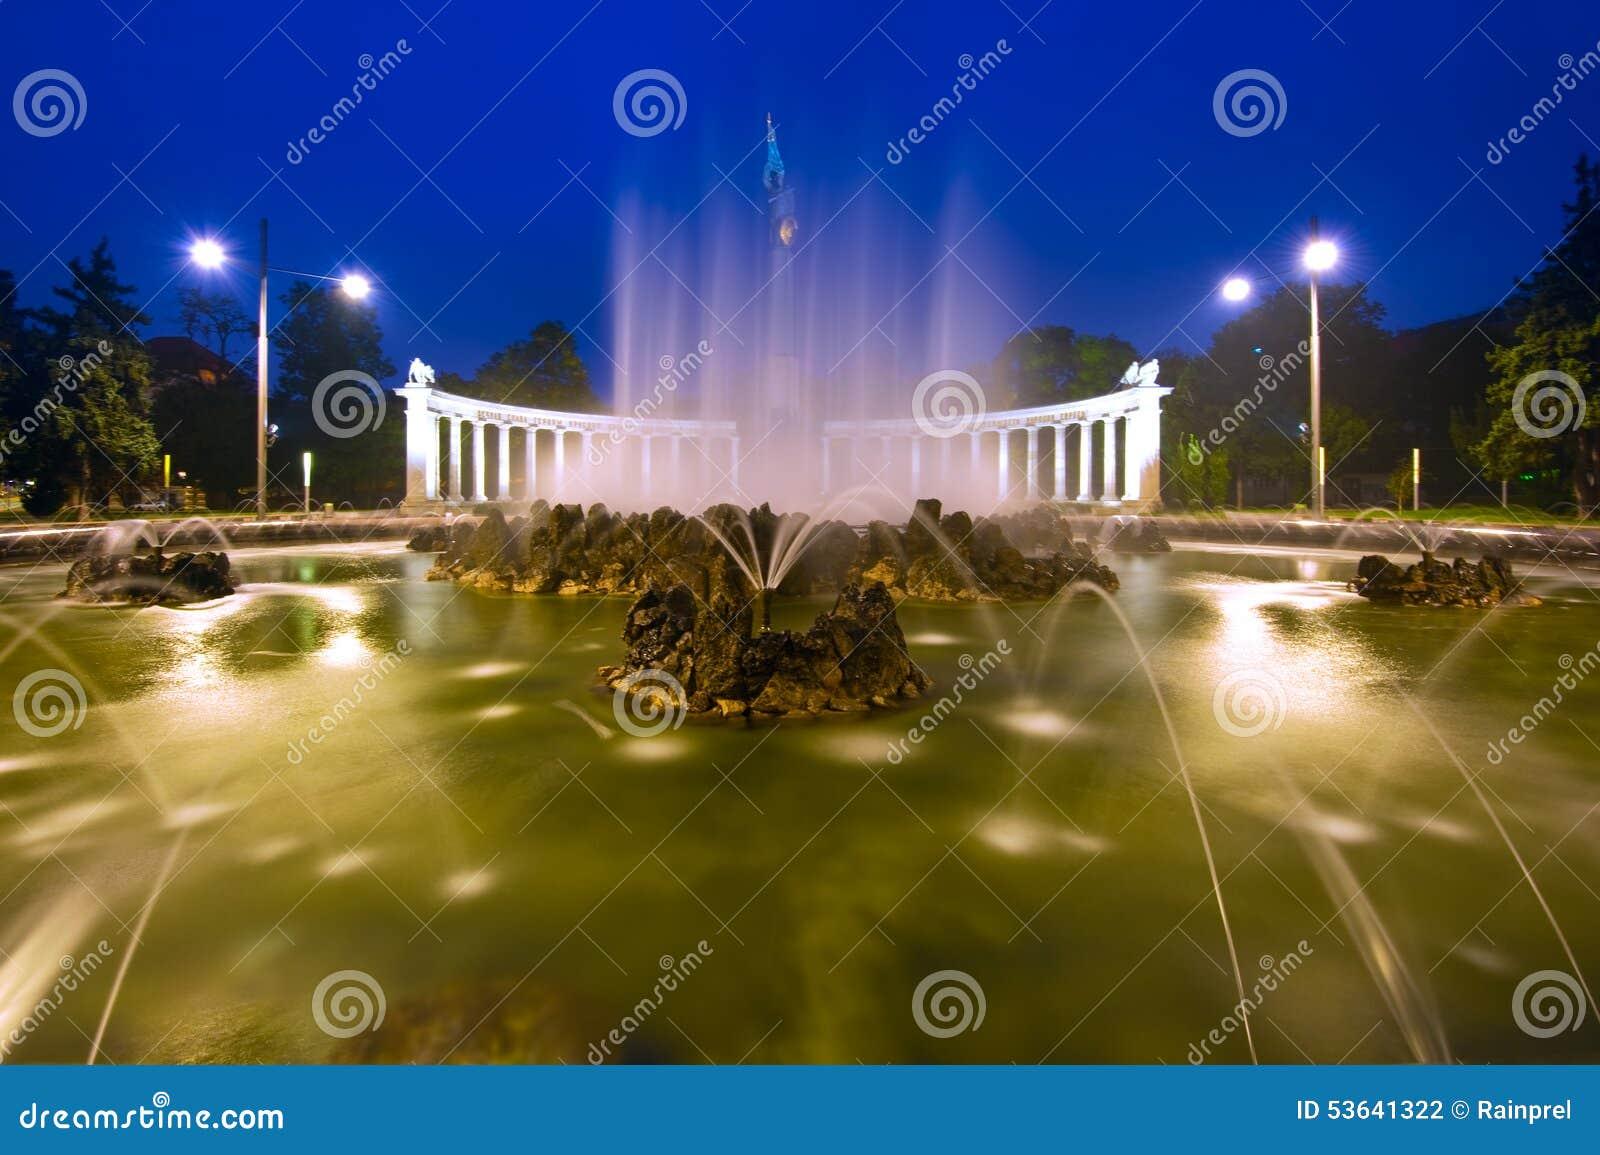 Hochstralbrunnen喷气机喷泉在维也纳,奥地利